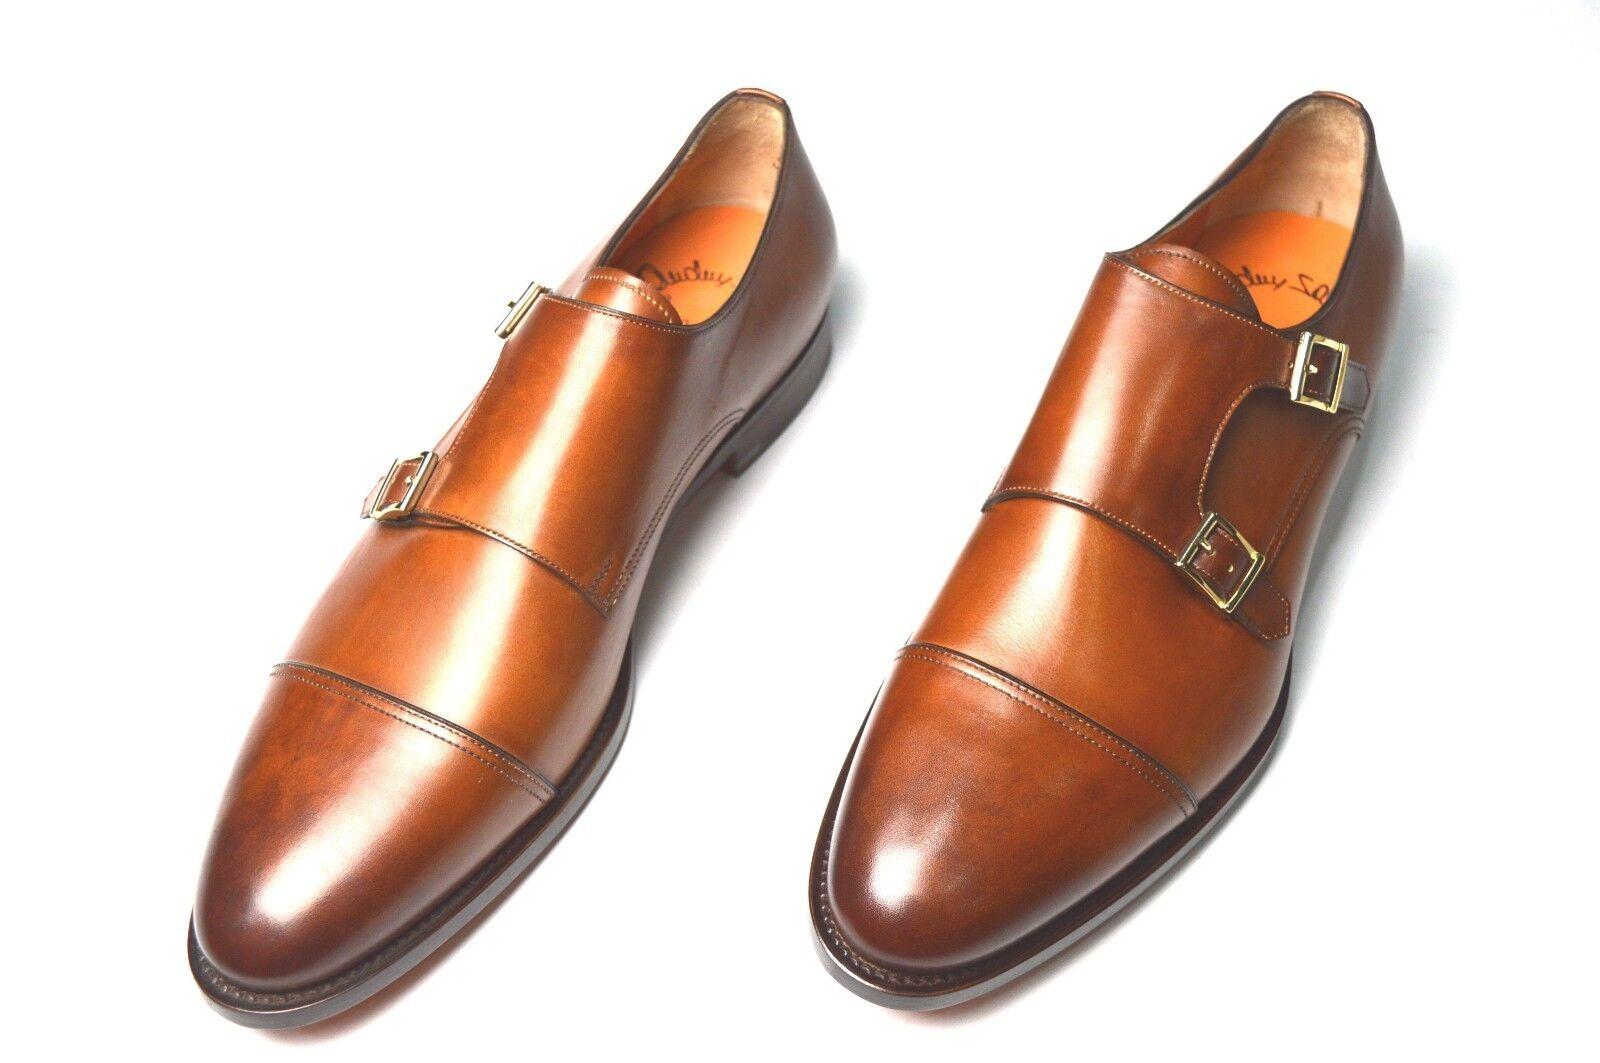 NEW SANTONI Dress Monk Strap Leather schuhe Größe Eu 44.5 44.5 44.5 Uk 10.5 Us 11.5 (1R) 142e84